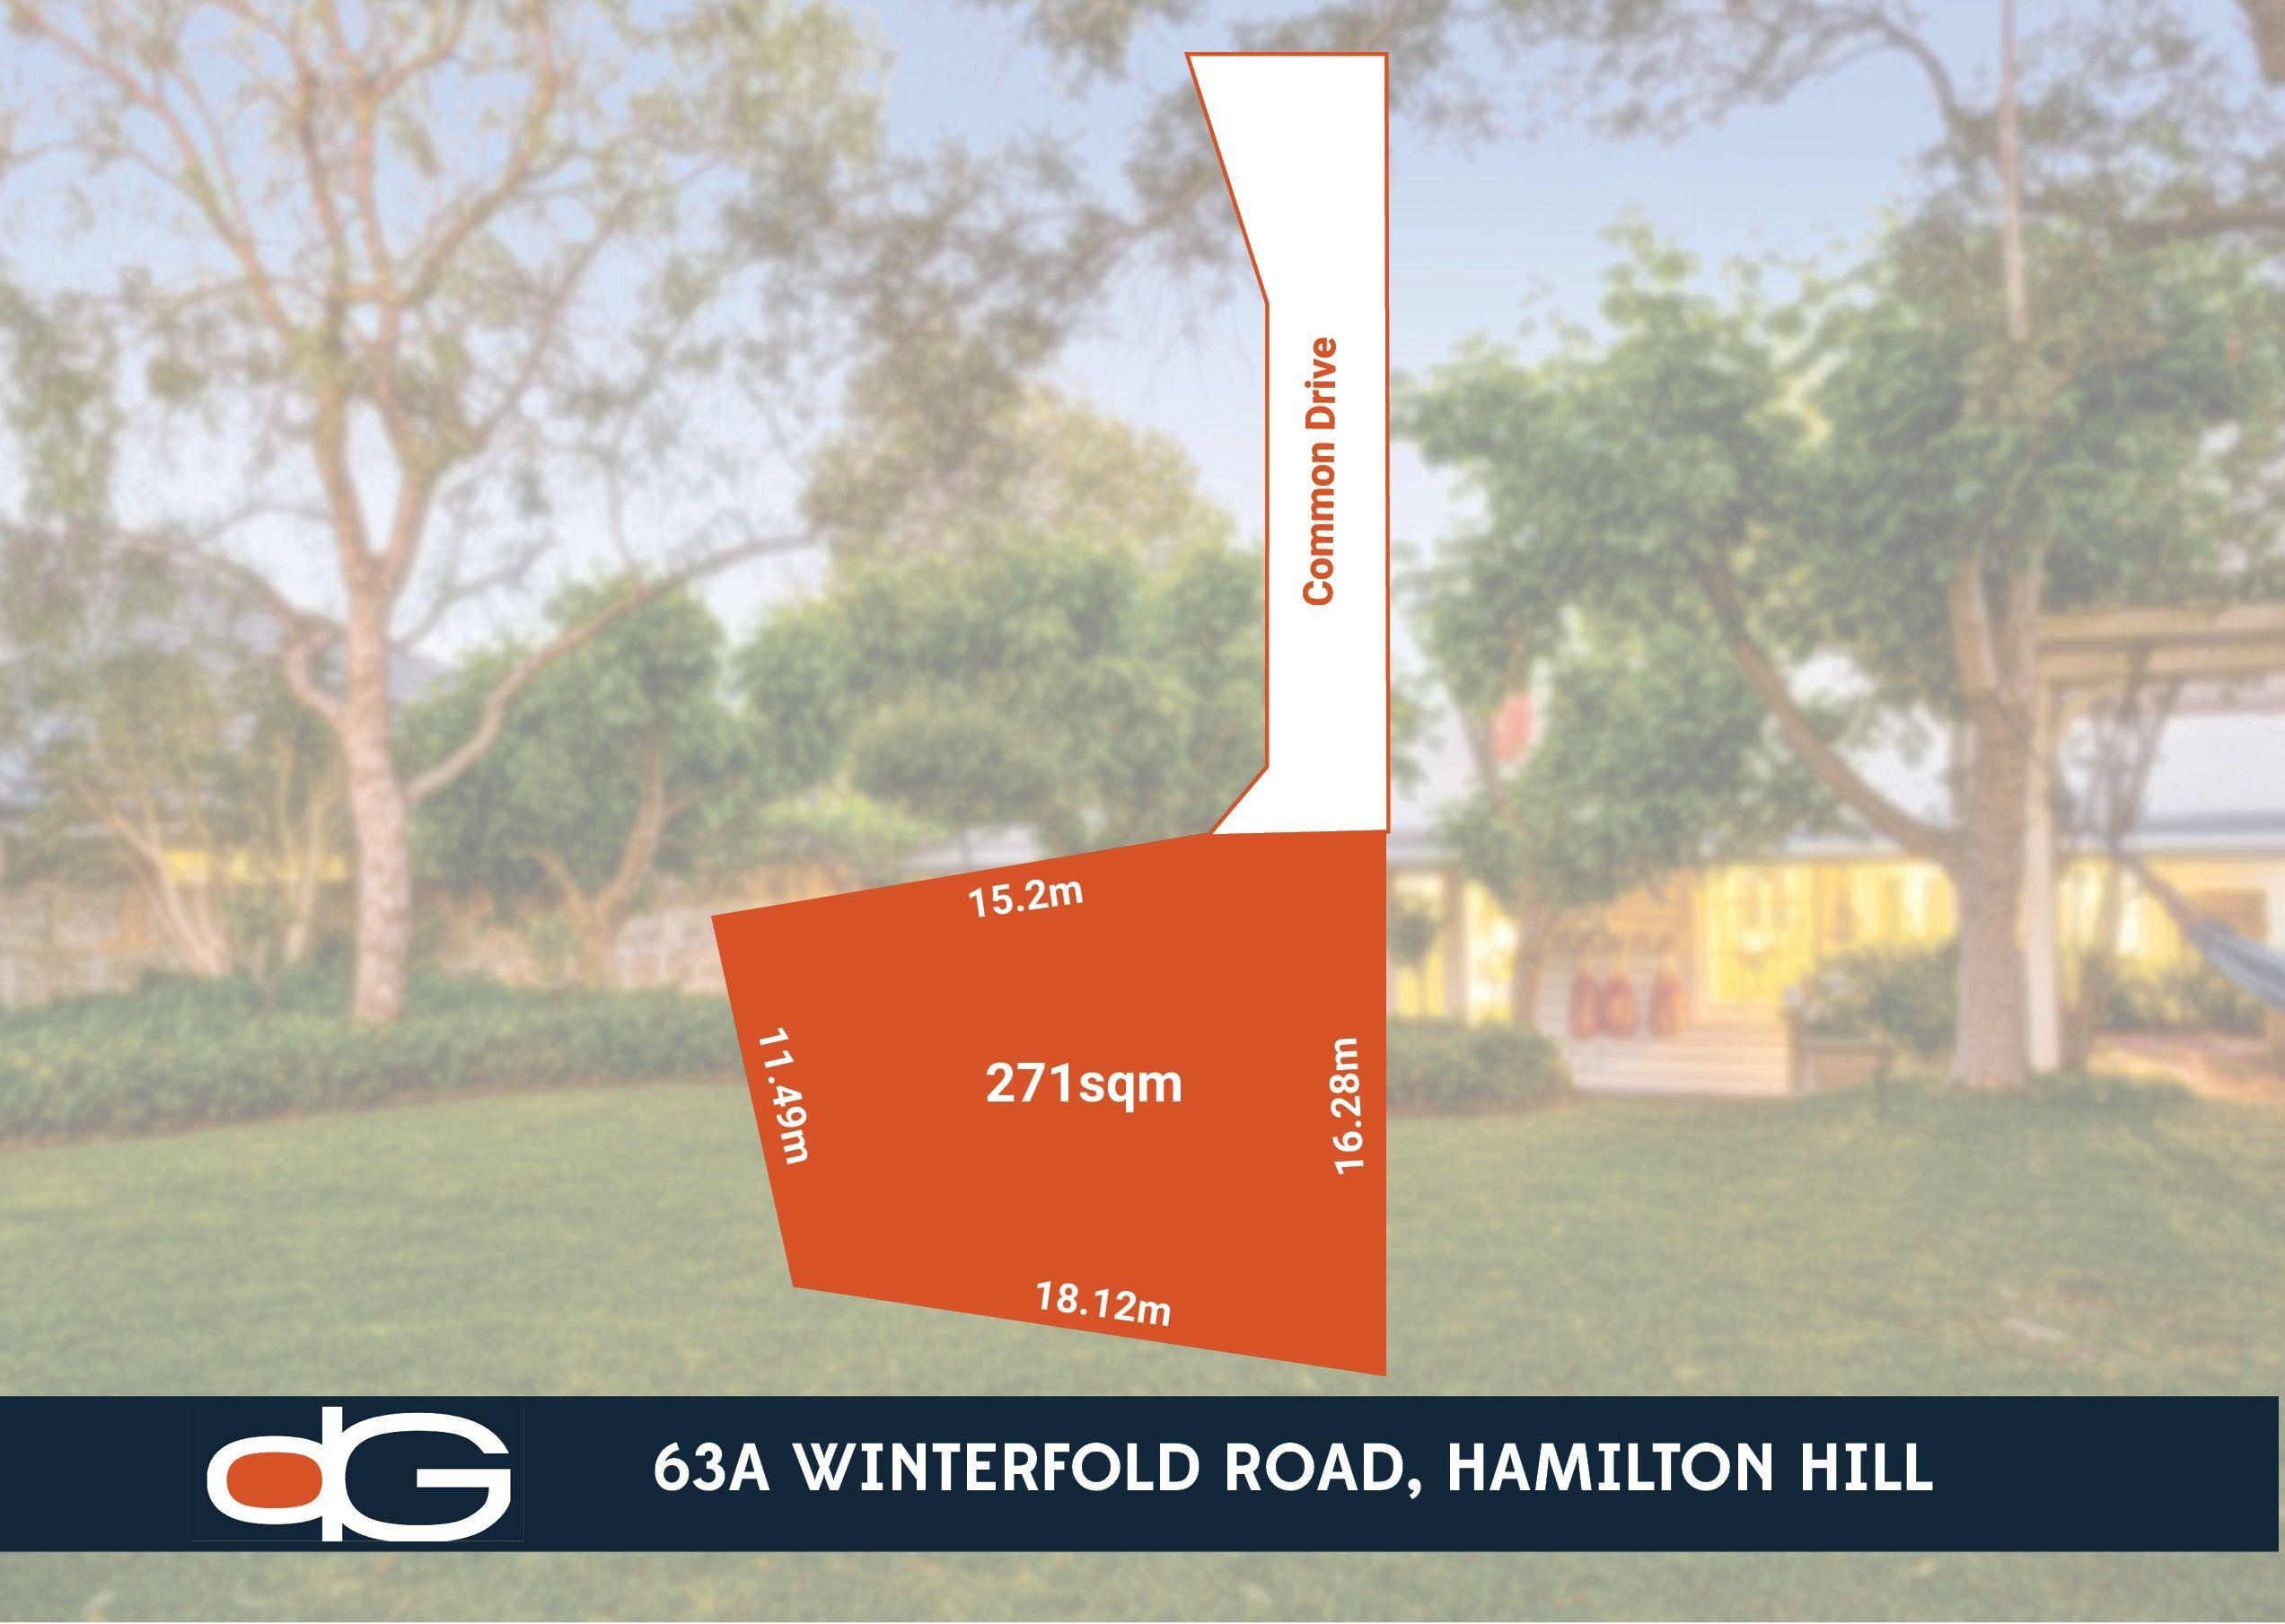 63A Winterfold Road, Hamilton Hill